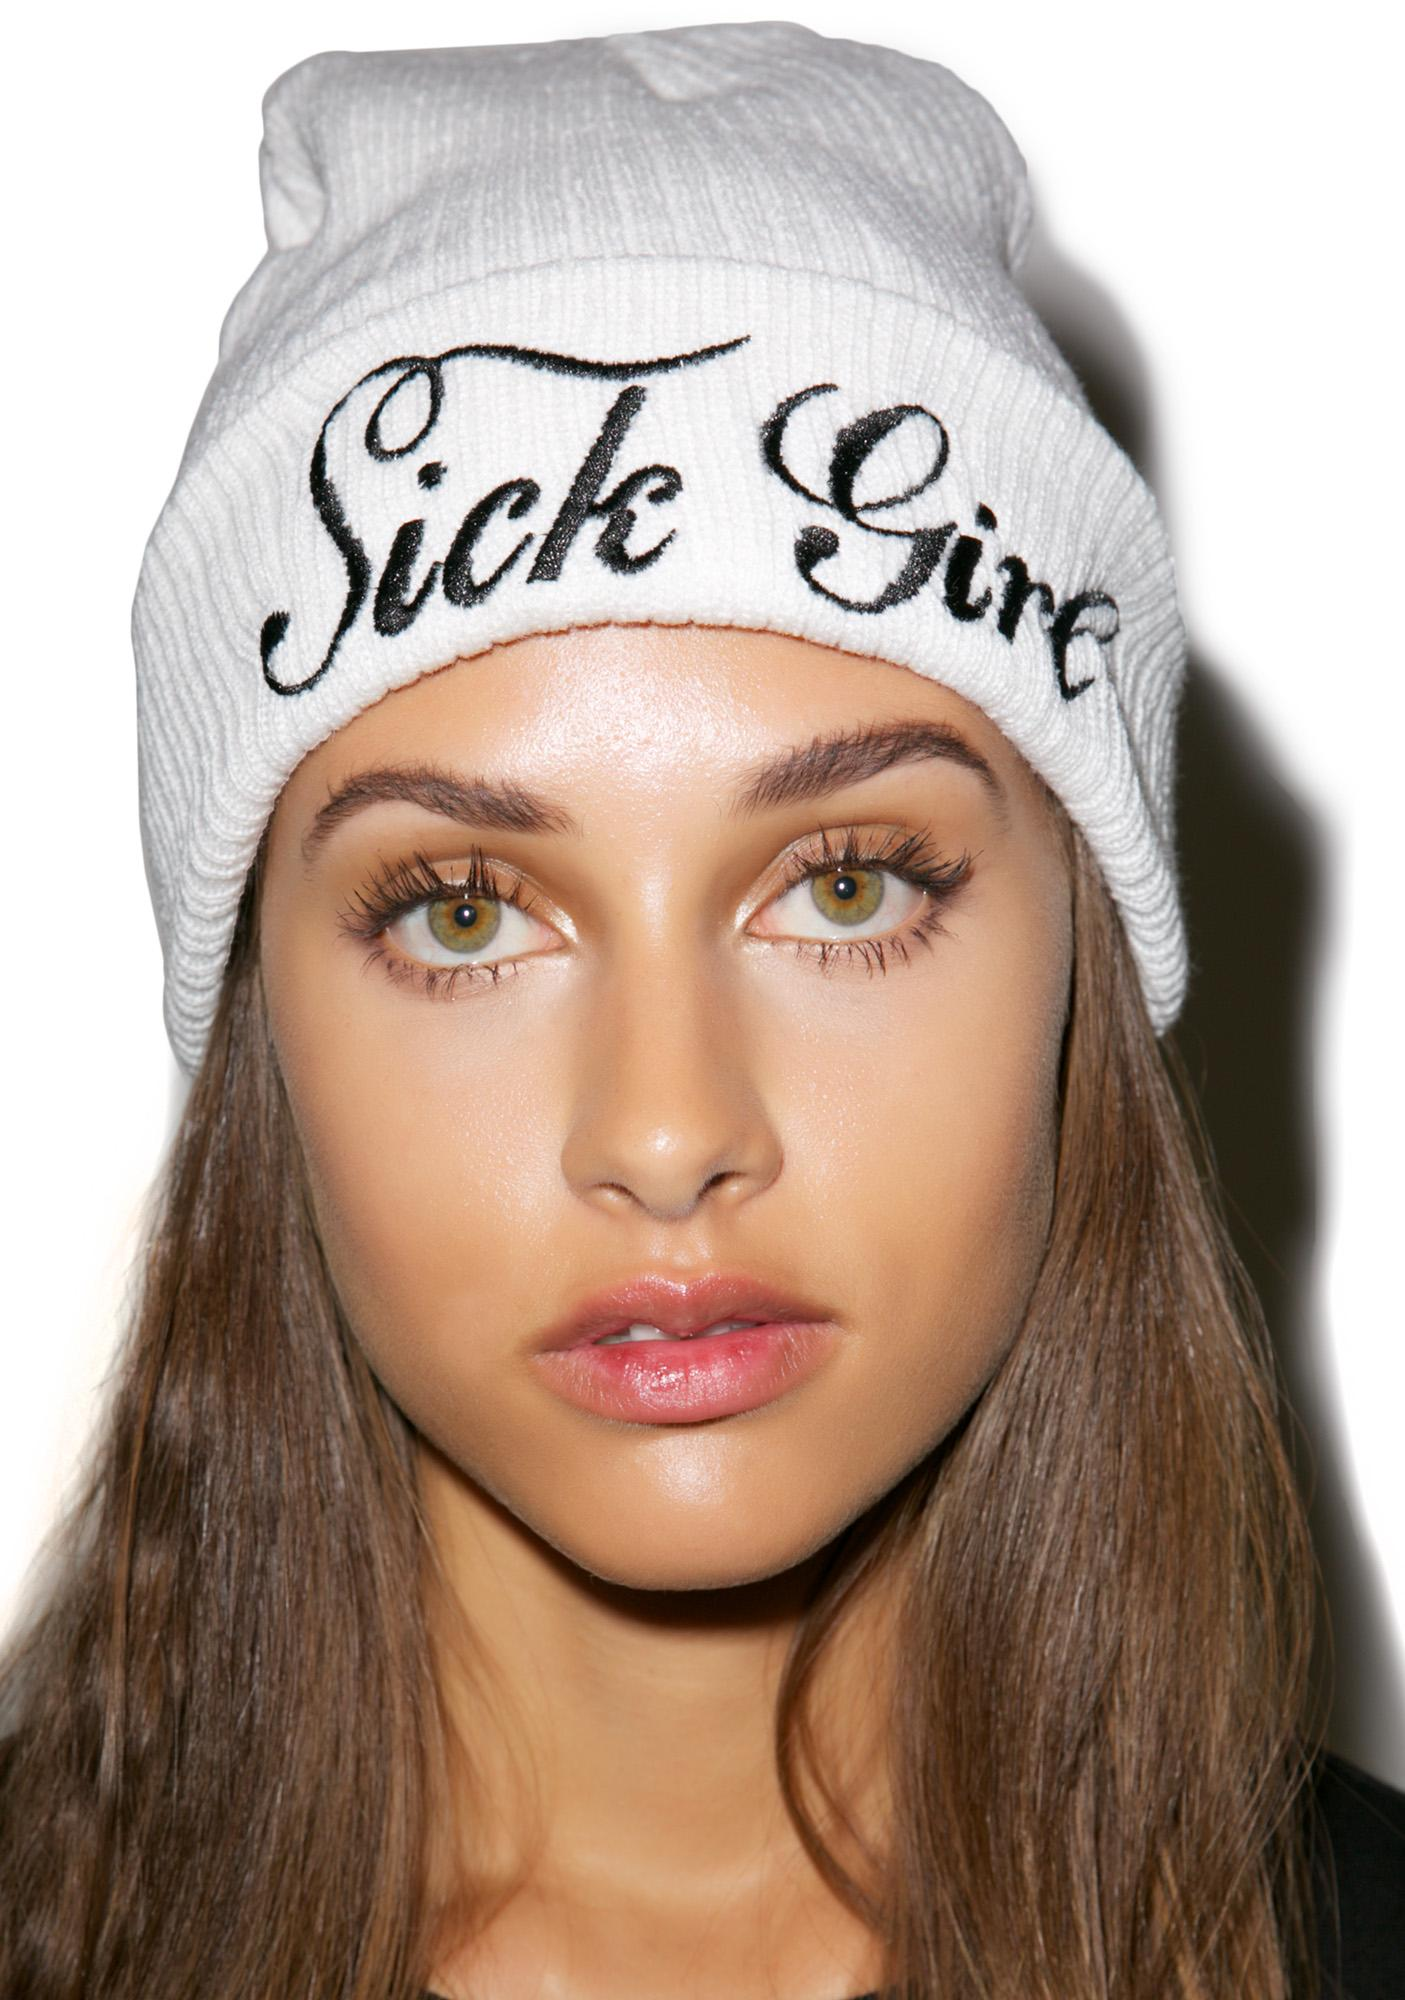 Sick Girl So Cold Sick Girl Beanie